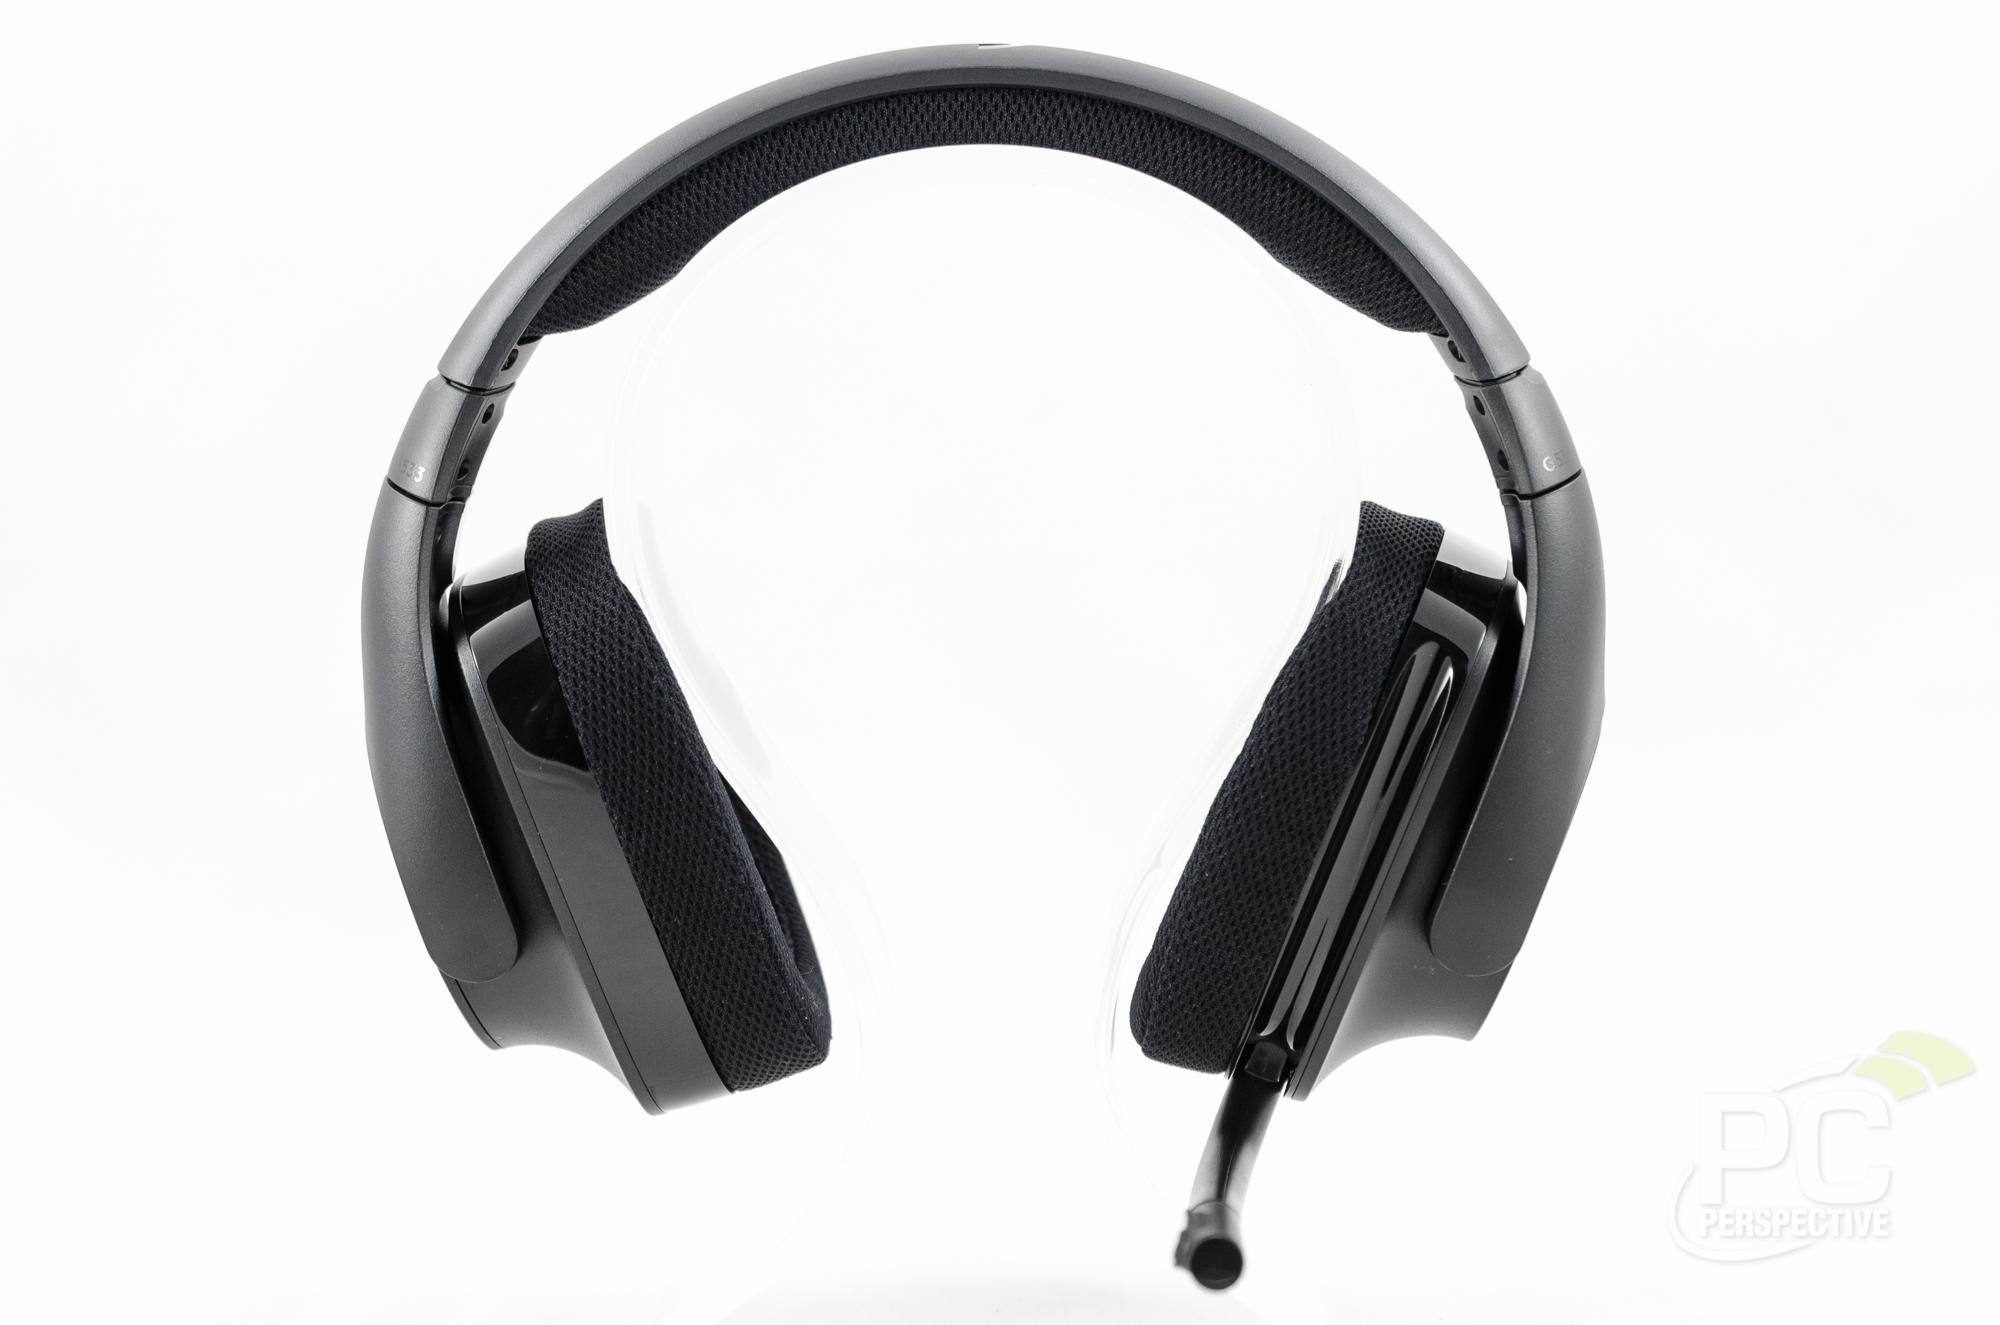 Logitech G533 Wireless 7 1 Surround Gaming Headset Review